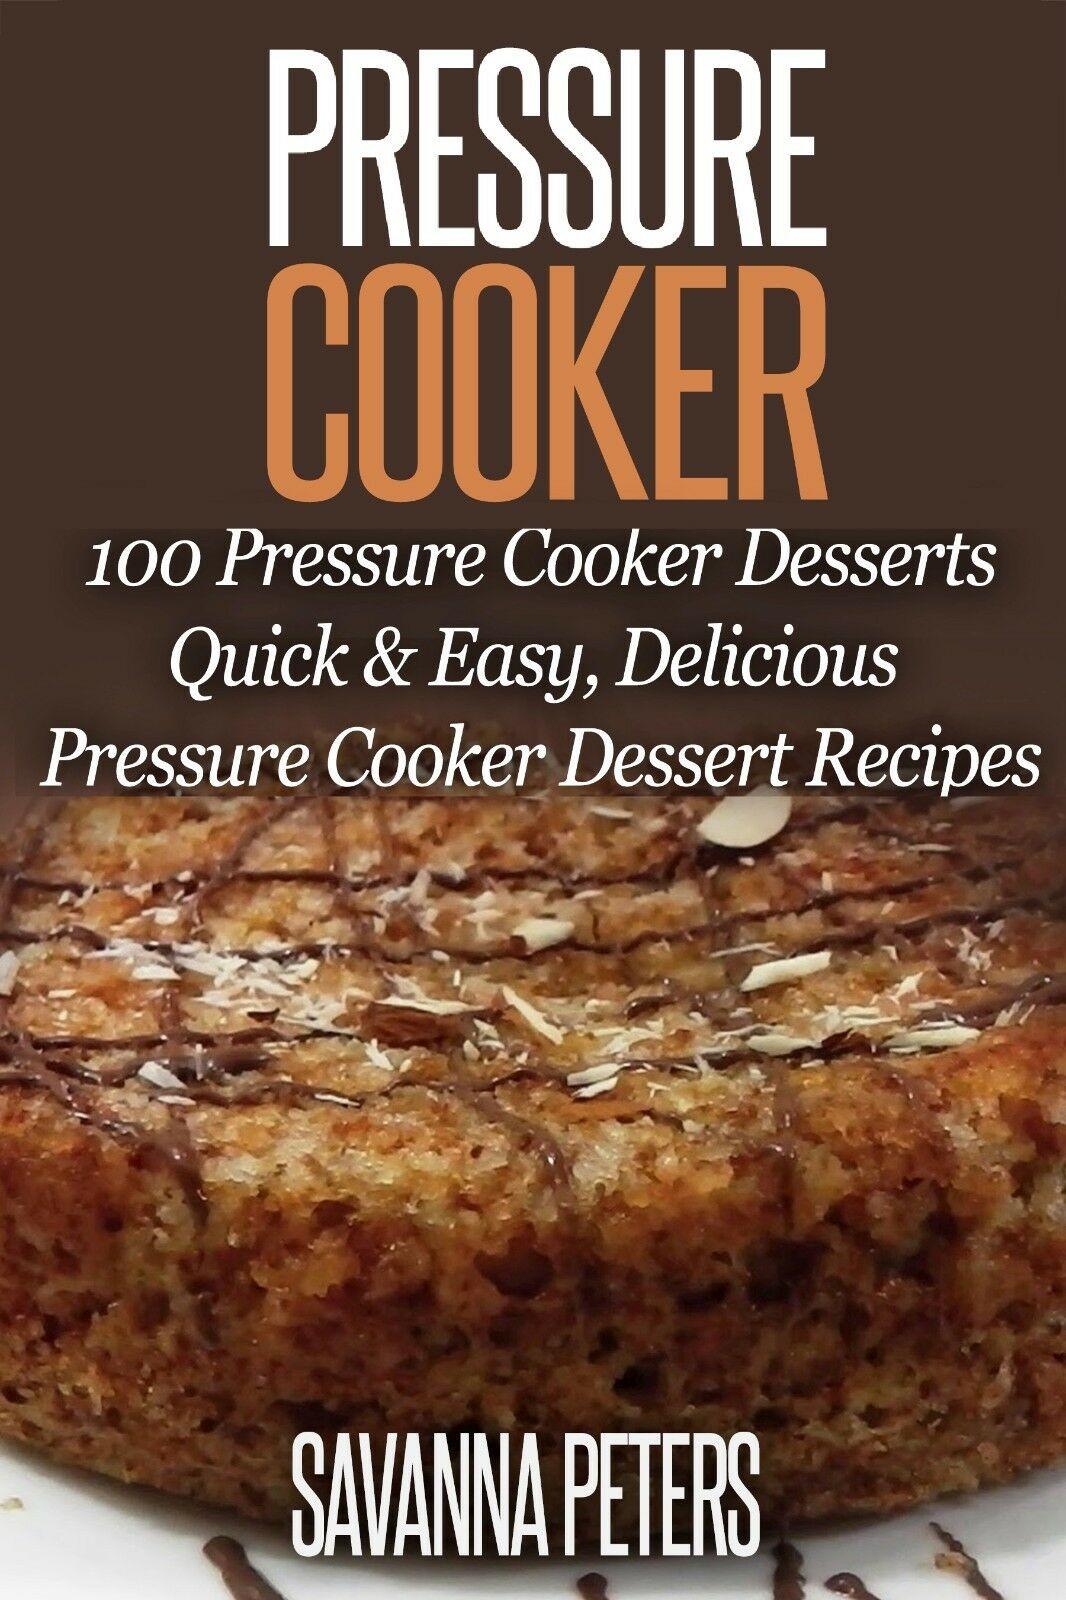 Pressure Cooker Dessert Recipes  Pressure Cooker 100 Pressure Cooker Desserts Quick